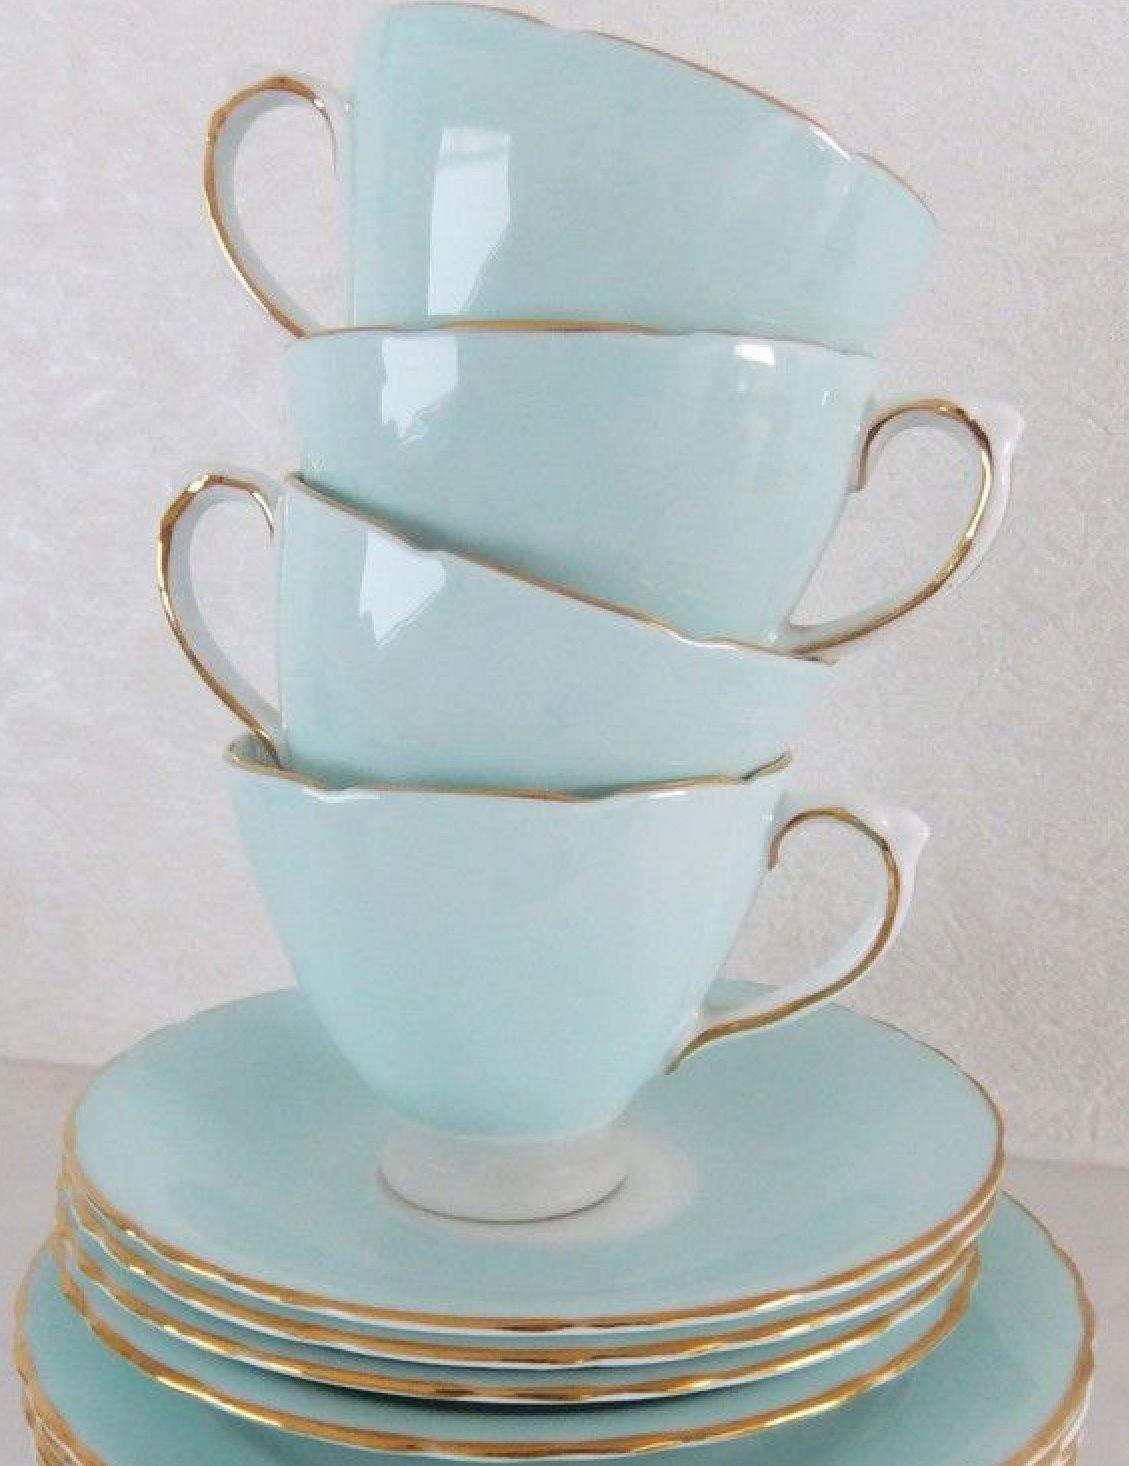 Duck Egg Blue With Images Bone China Tea Set China Tea Sets